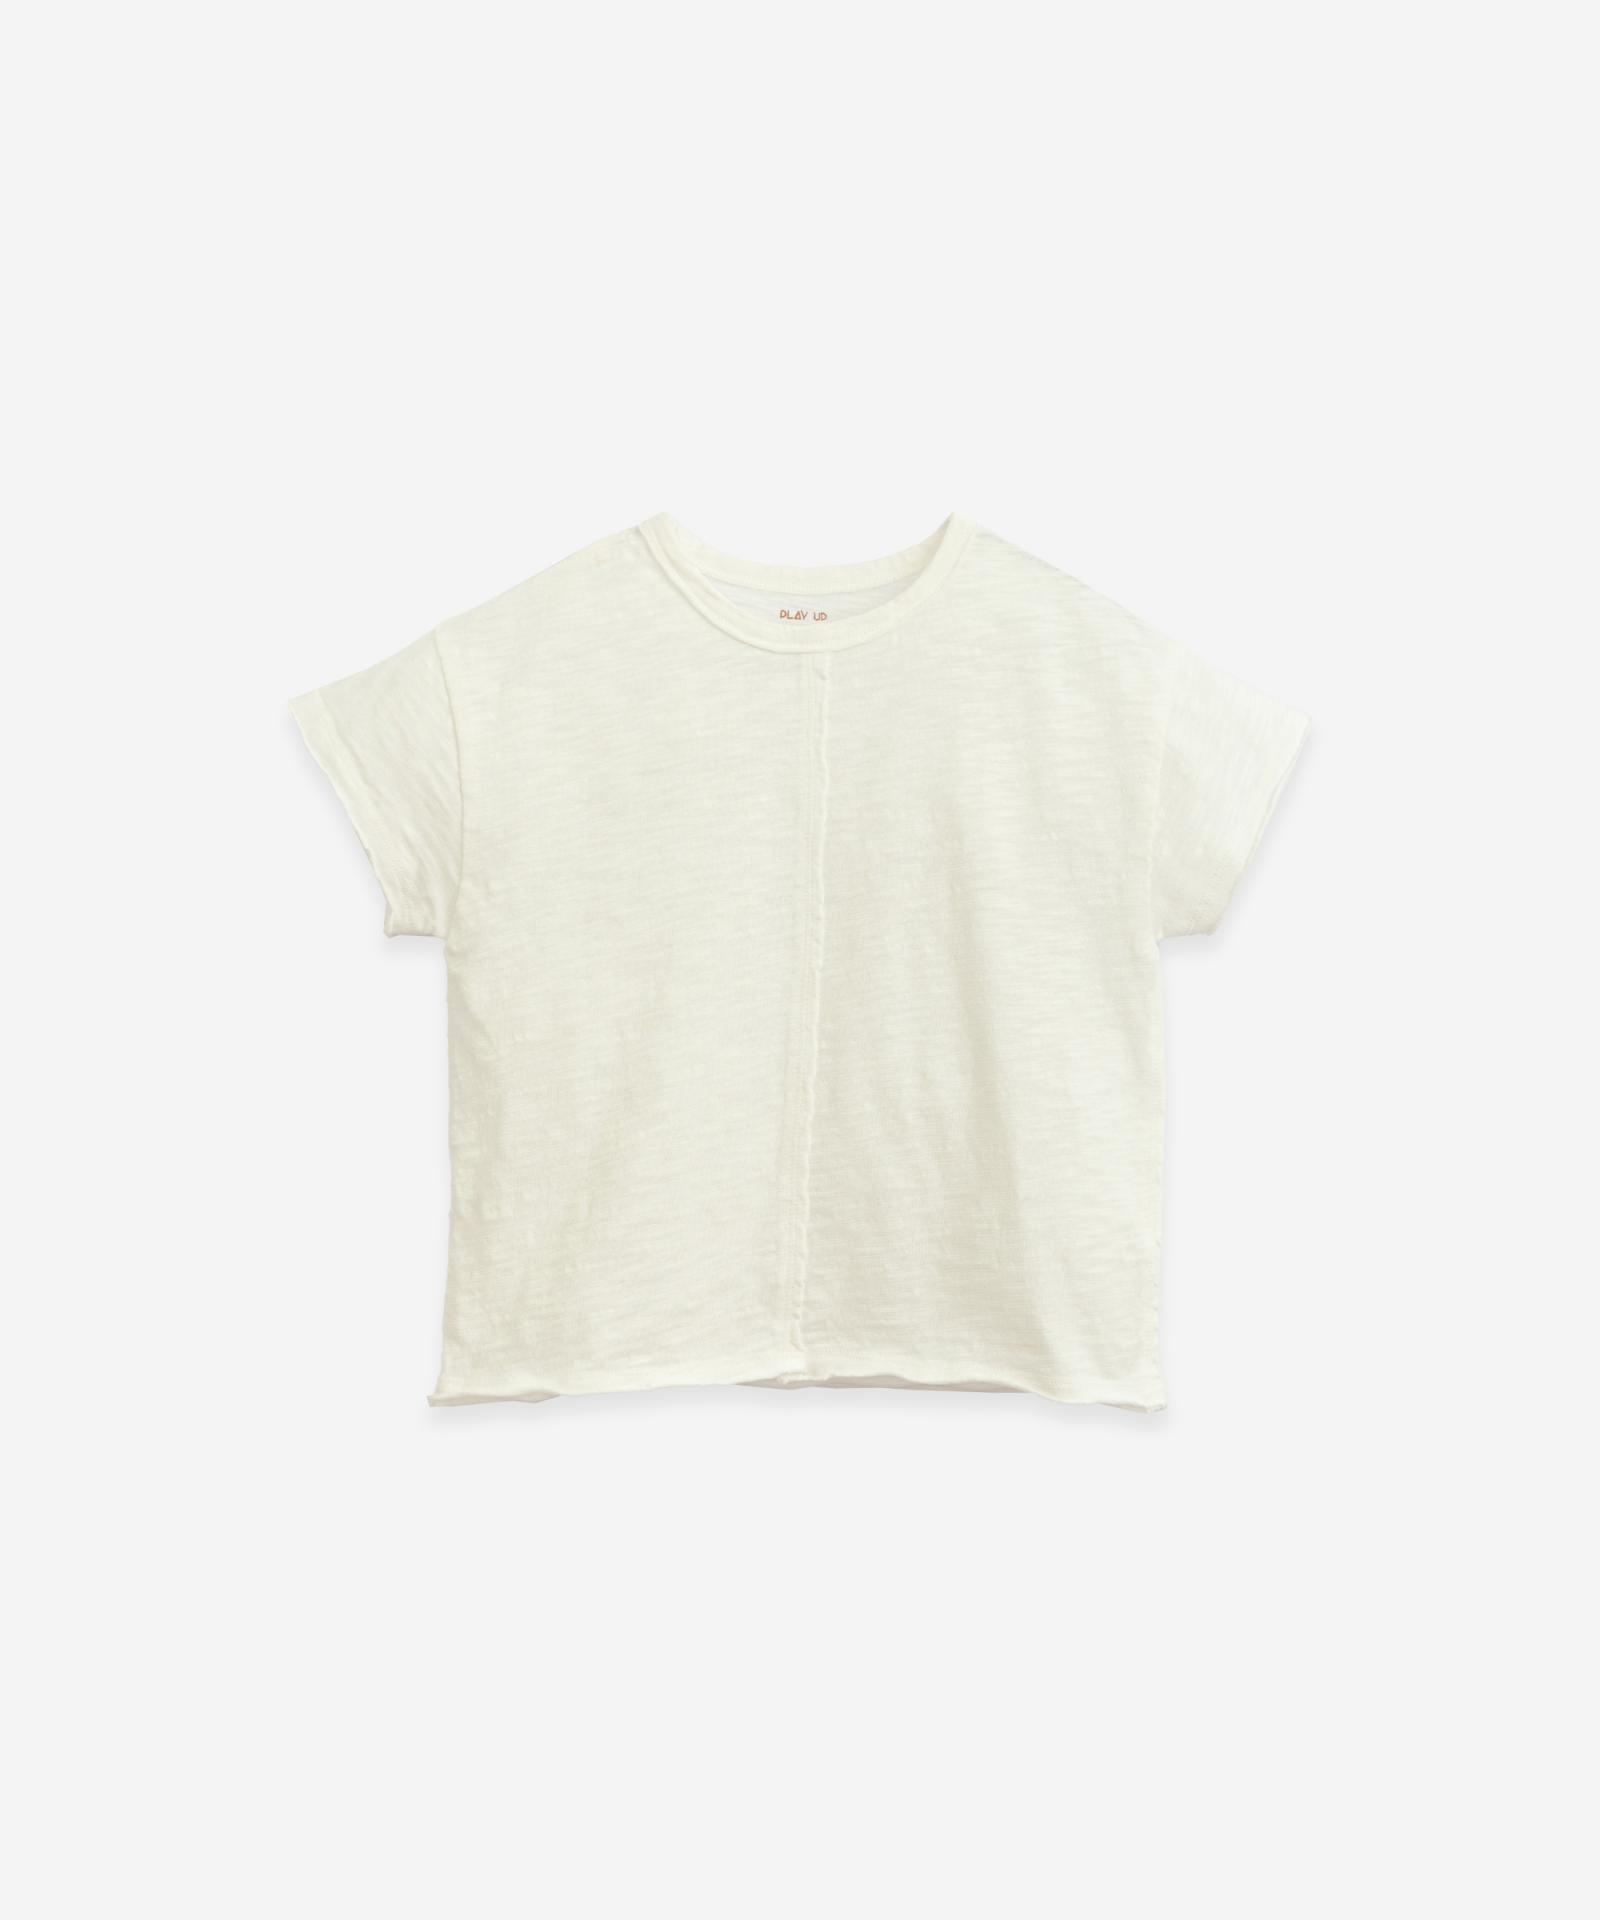 Camiseta Algodon Organico Play Up